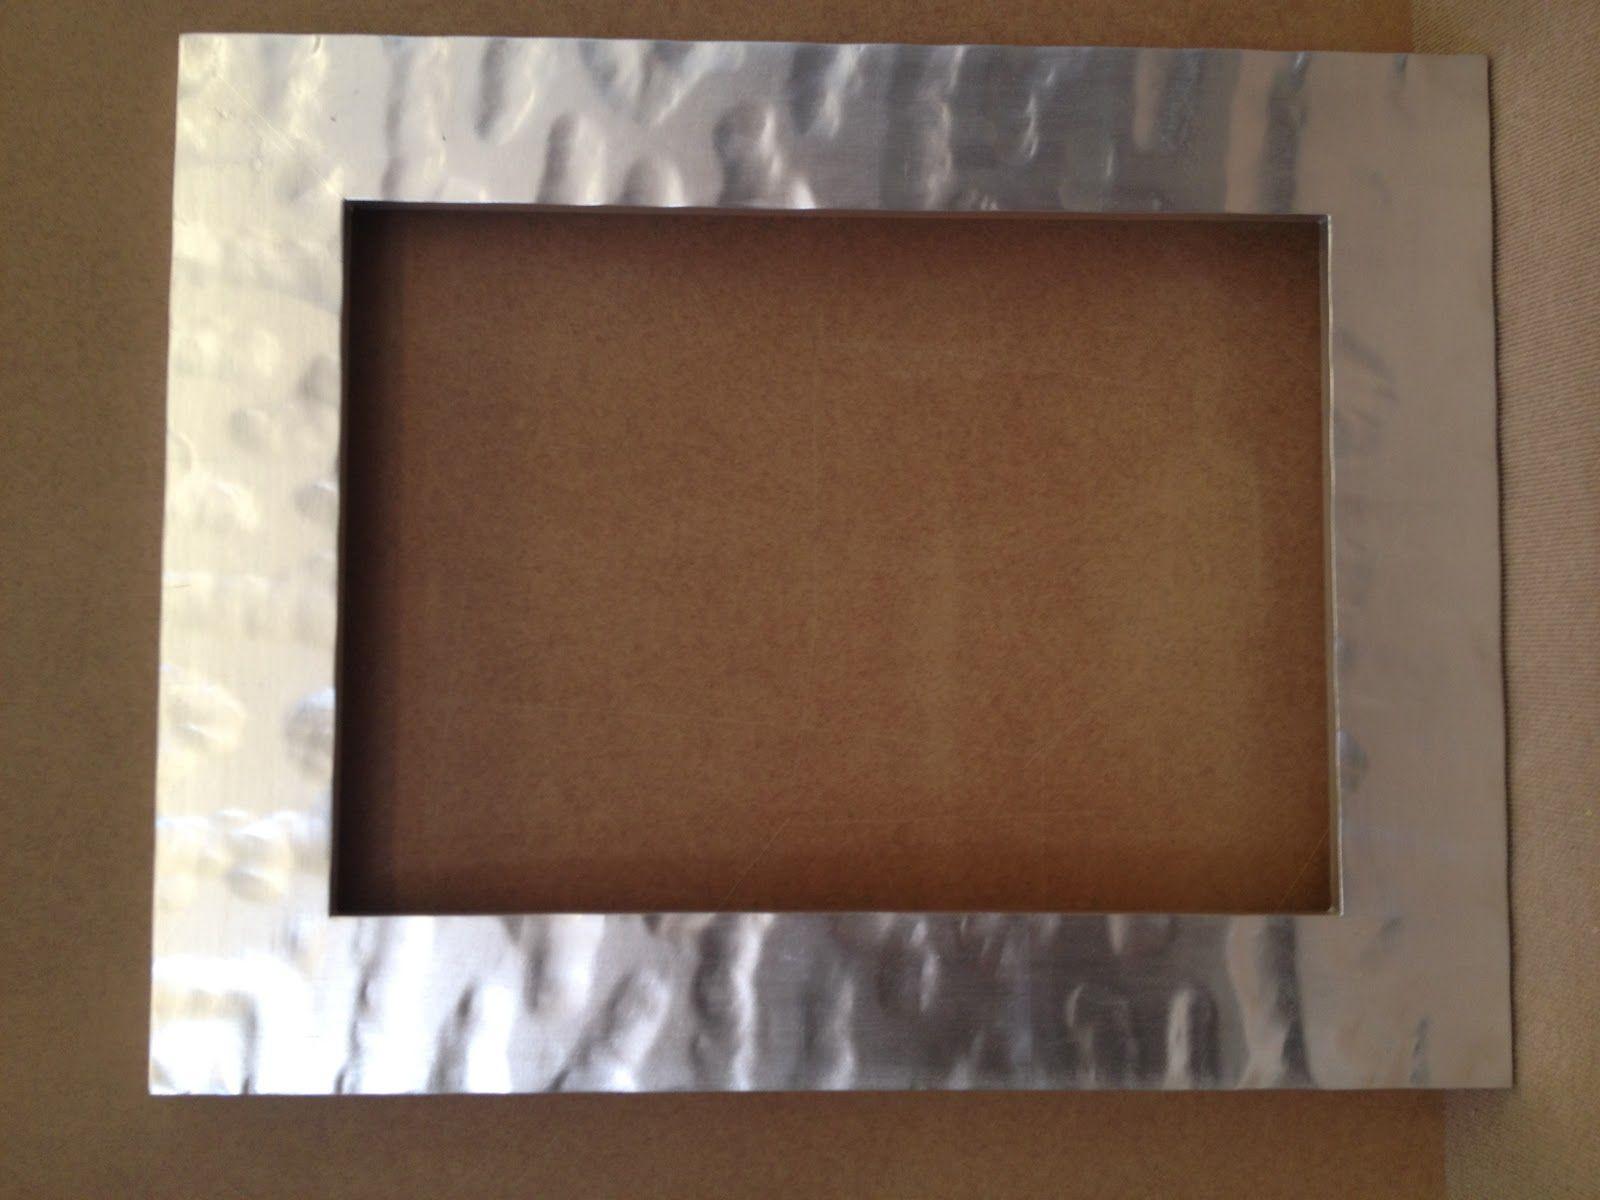 kino marcos molduras marcos para cuadros enmarcacion